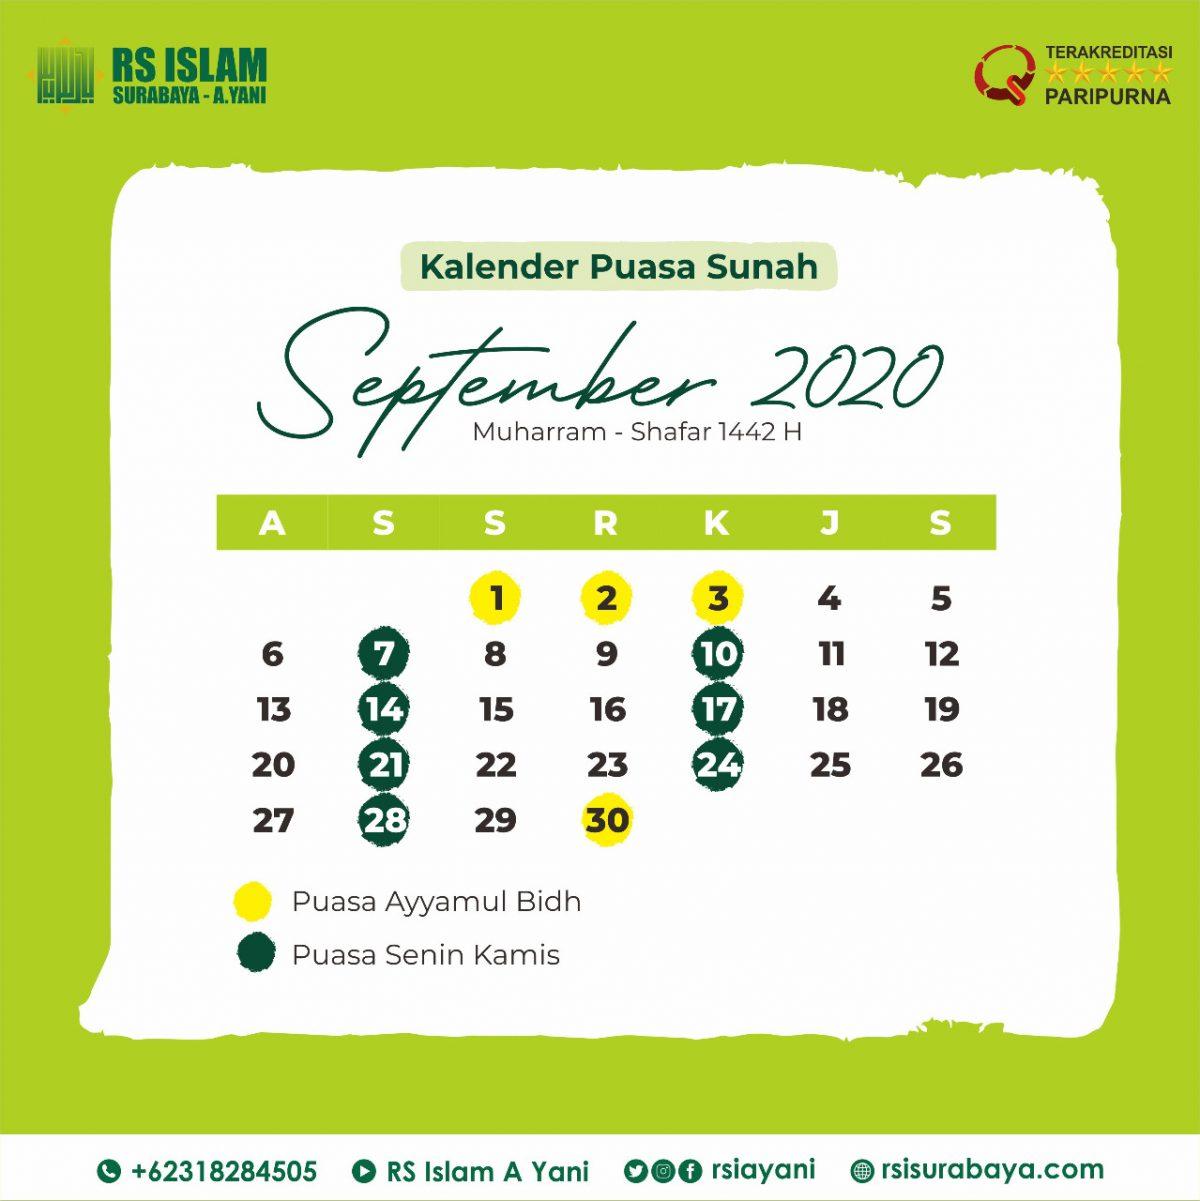 Kalender Puasa Sunnah September Rs Islam Surabaya